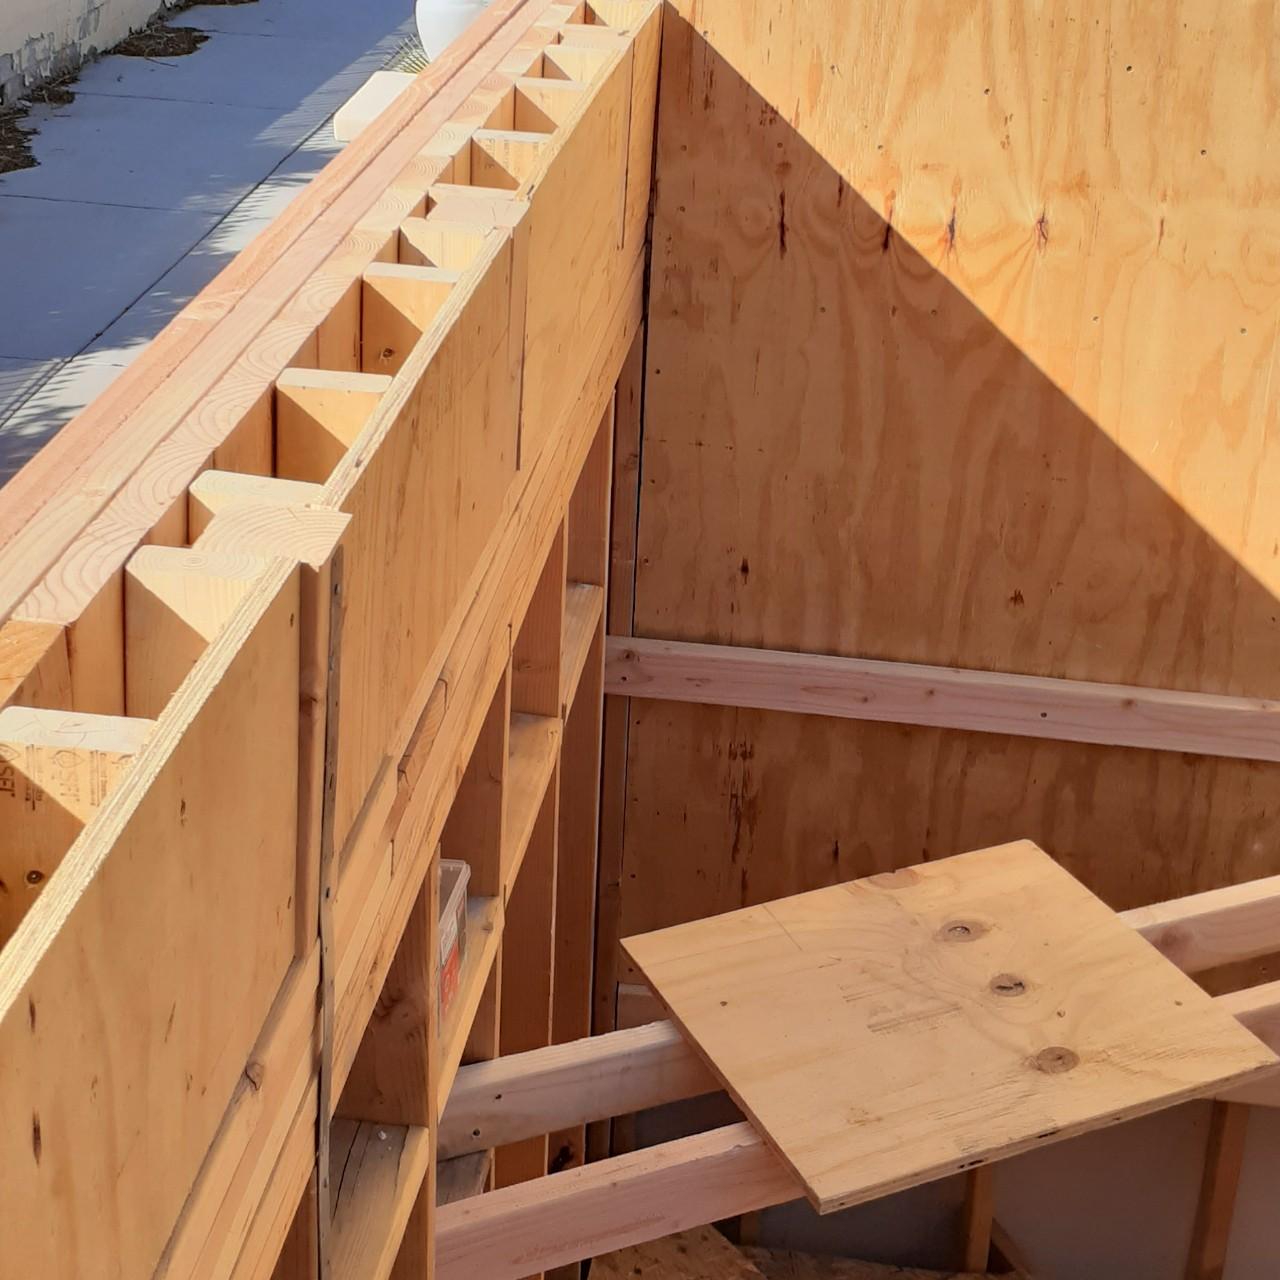 carpentry-wood-framing-second-floor-home-addition--framing-67